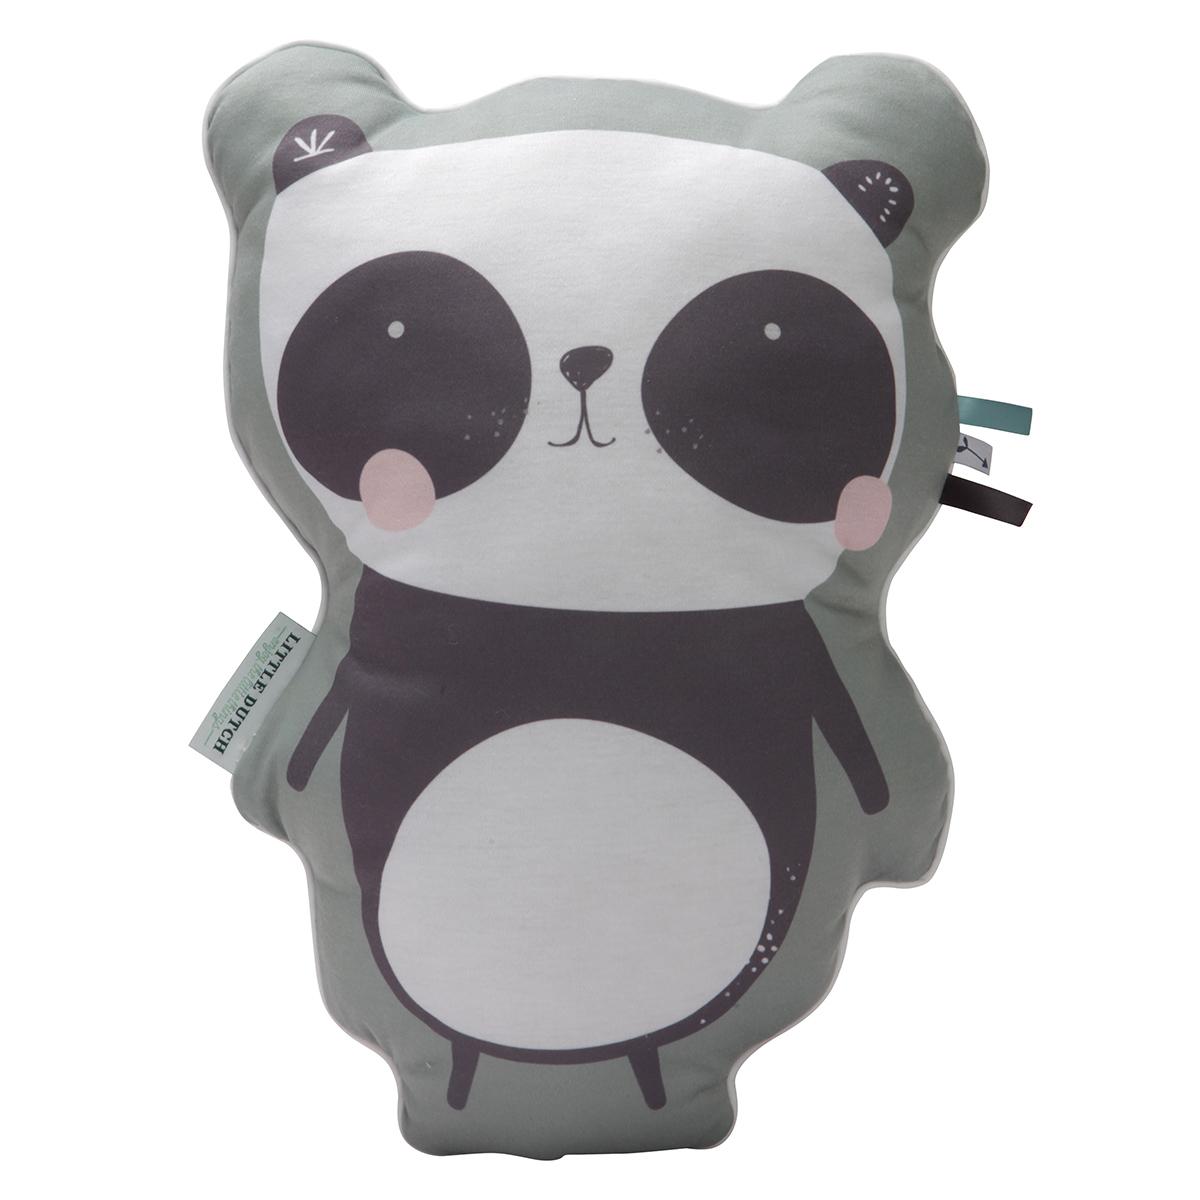 Coussin Coussin Aventure Panda - Menthe Coussin Aventure Panda - Menthe